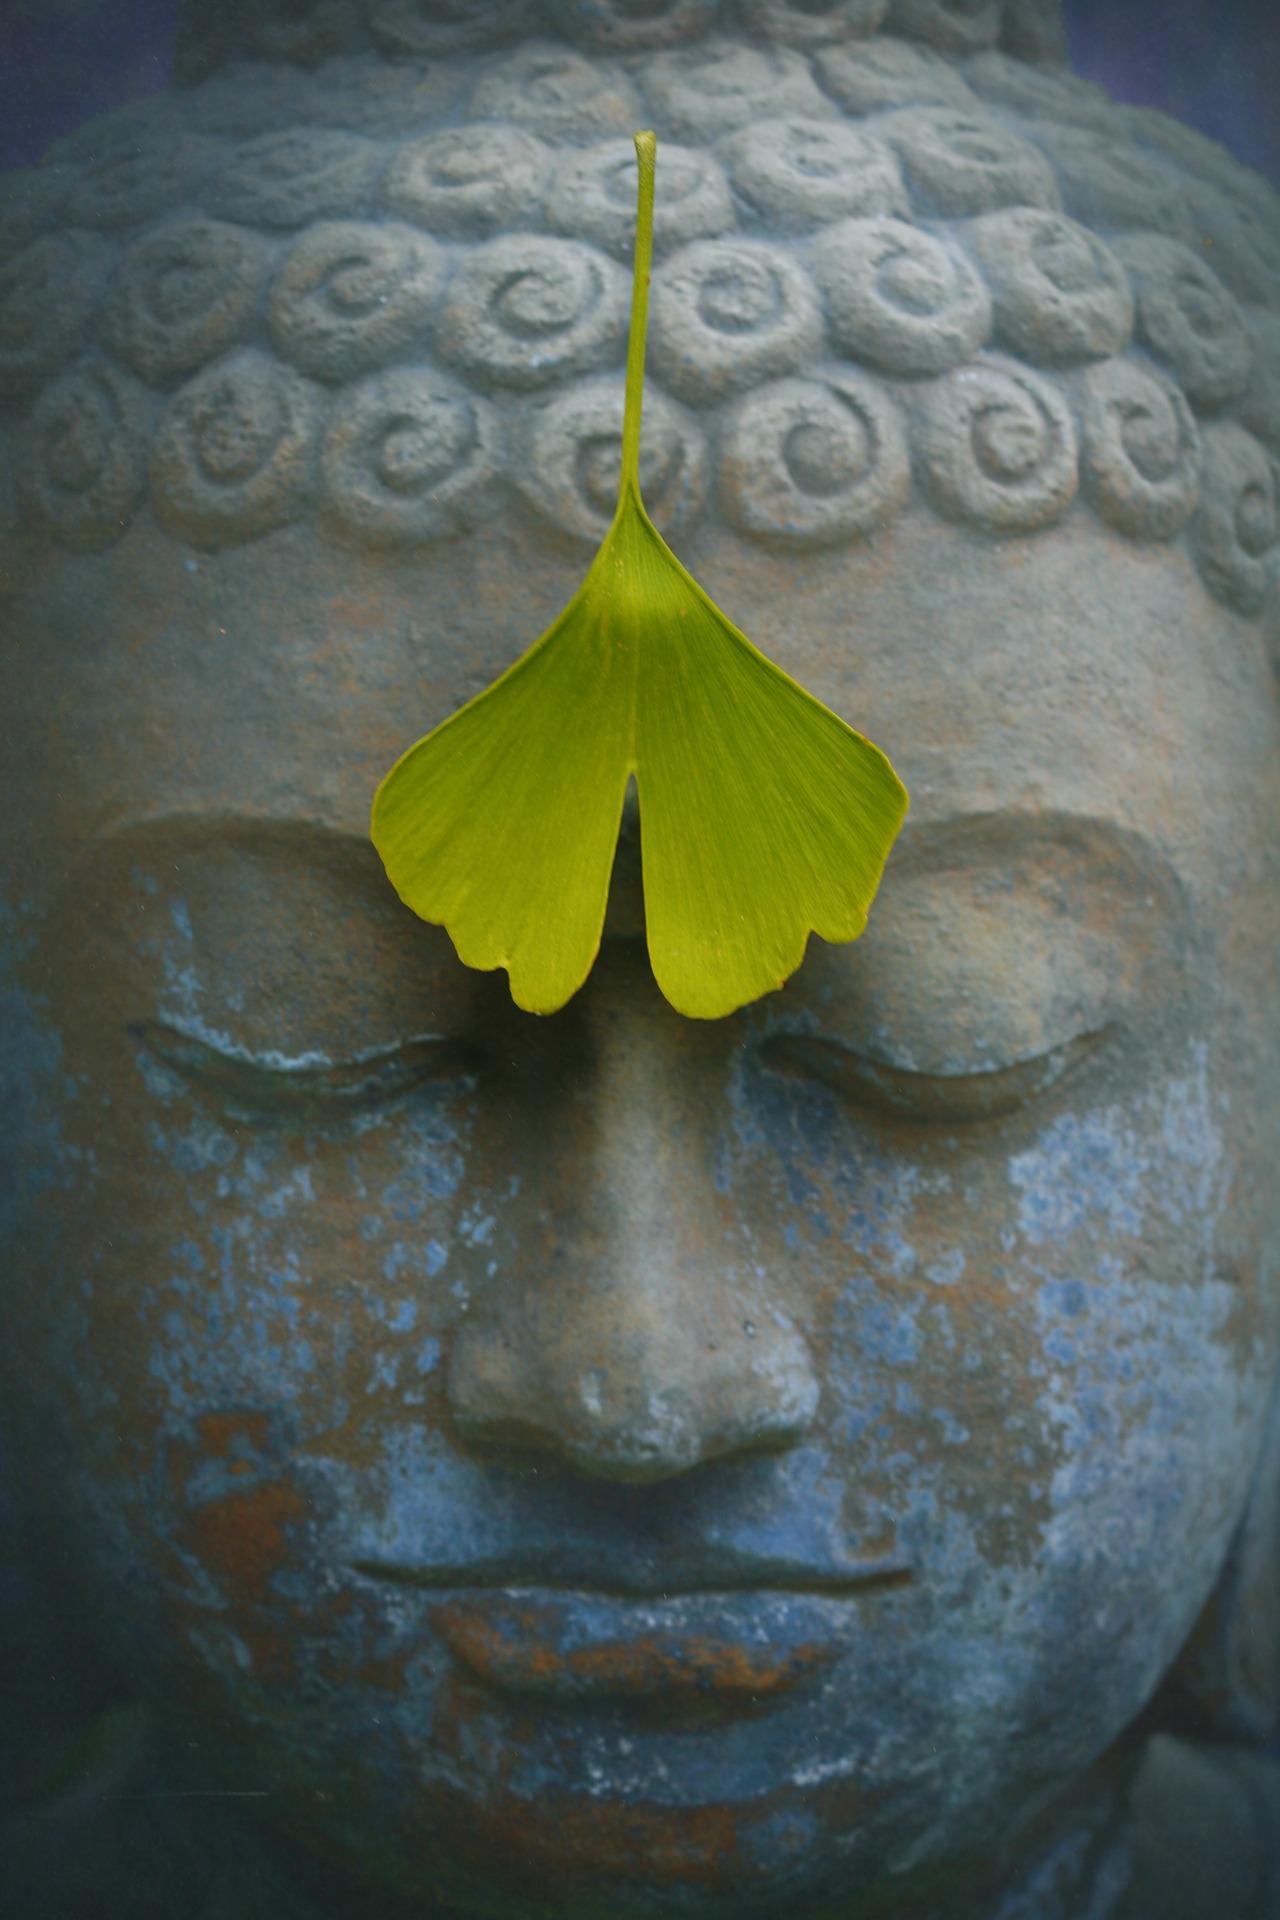 buddha-2728793_1920.jpg